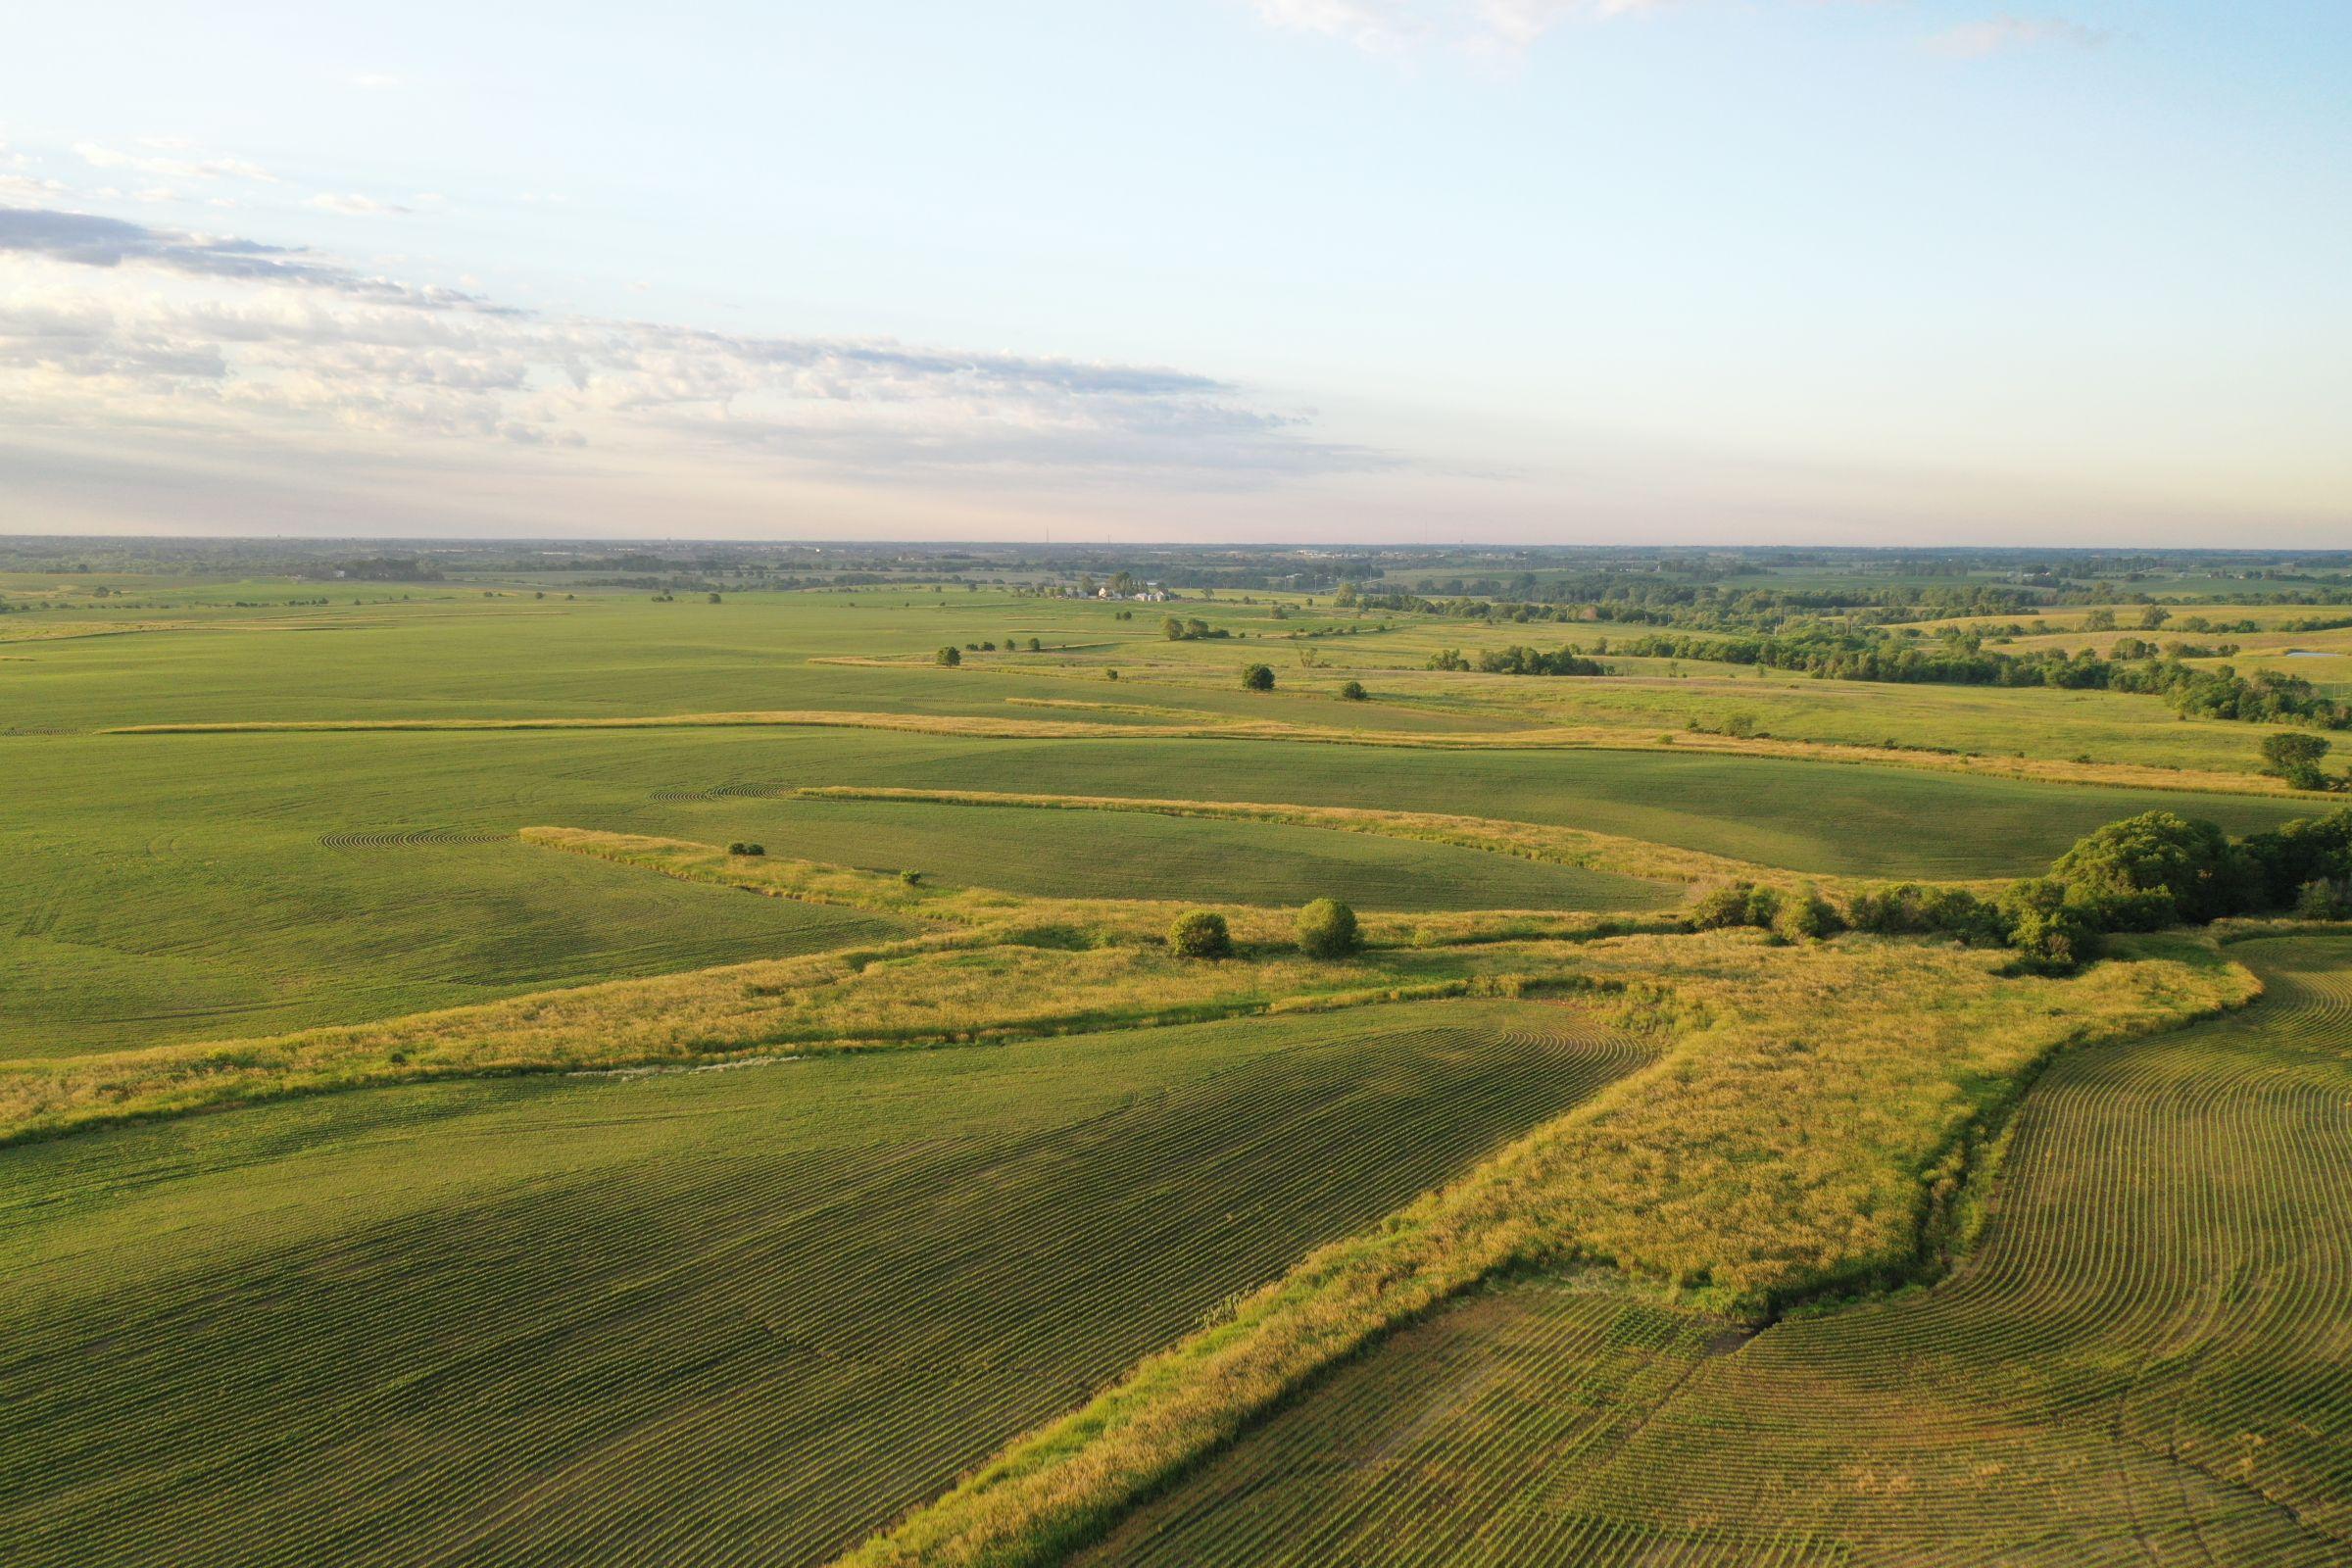 land-clarke-county-iowa-883-acres-listing-number-15596-8-2021-06-23-163321.JPG